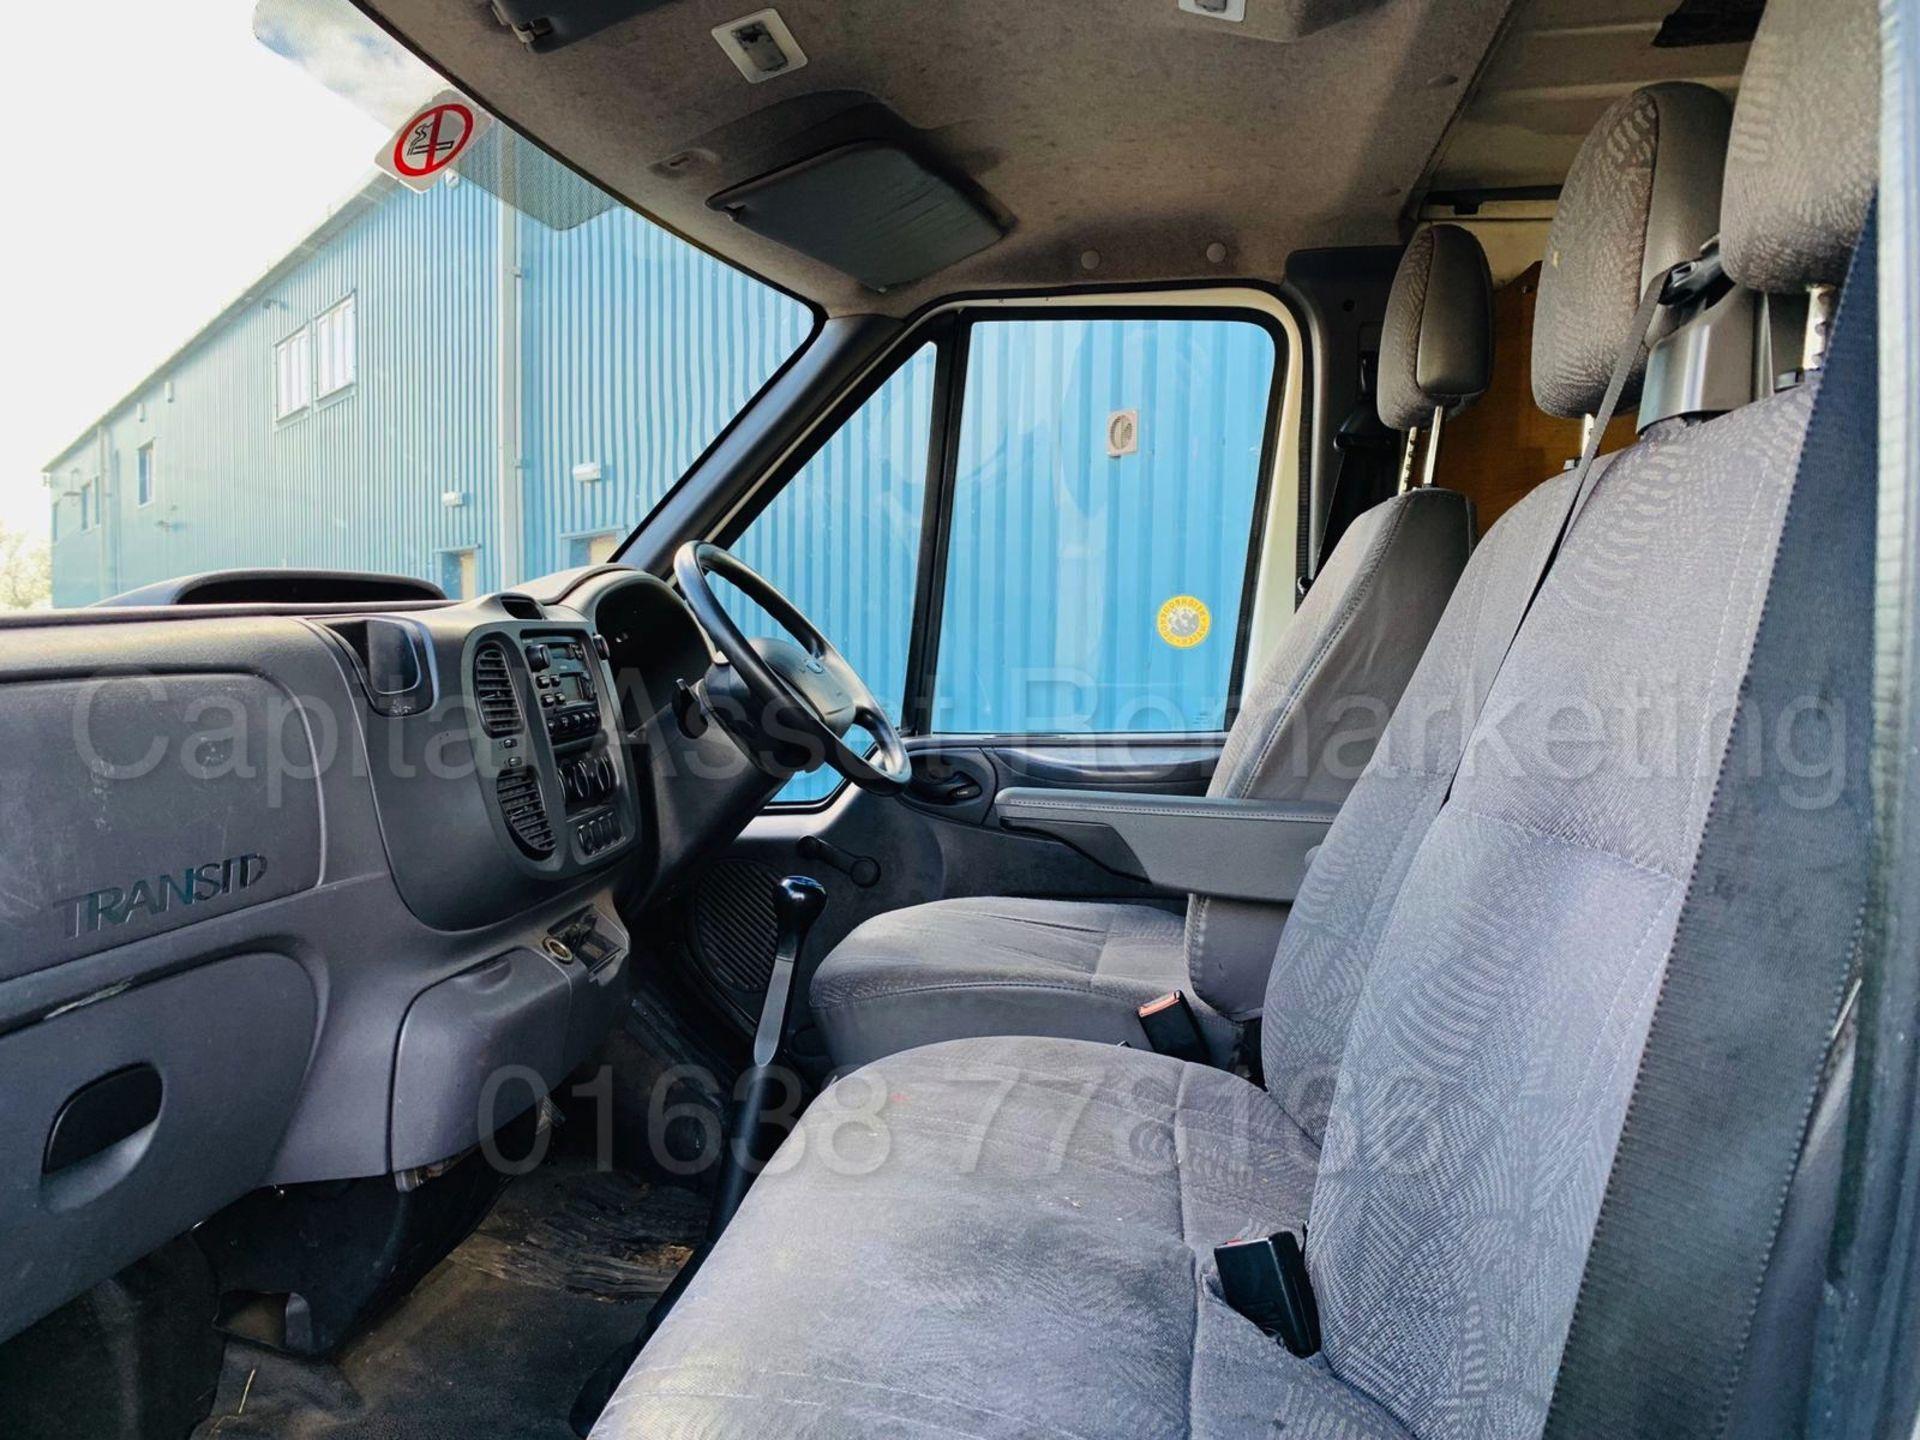 Lot 45 - (On Sale) FORD TRANSIT T300 *SWB -PANEL VAN* (2005) '2.3 PETROL/GAS - BI-FUEL - 140 BHP' *LOW MILES*